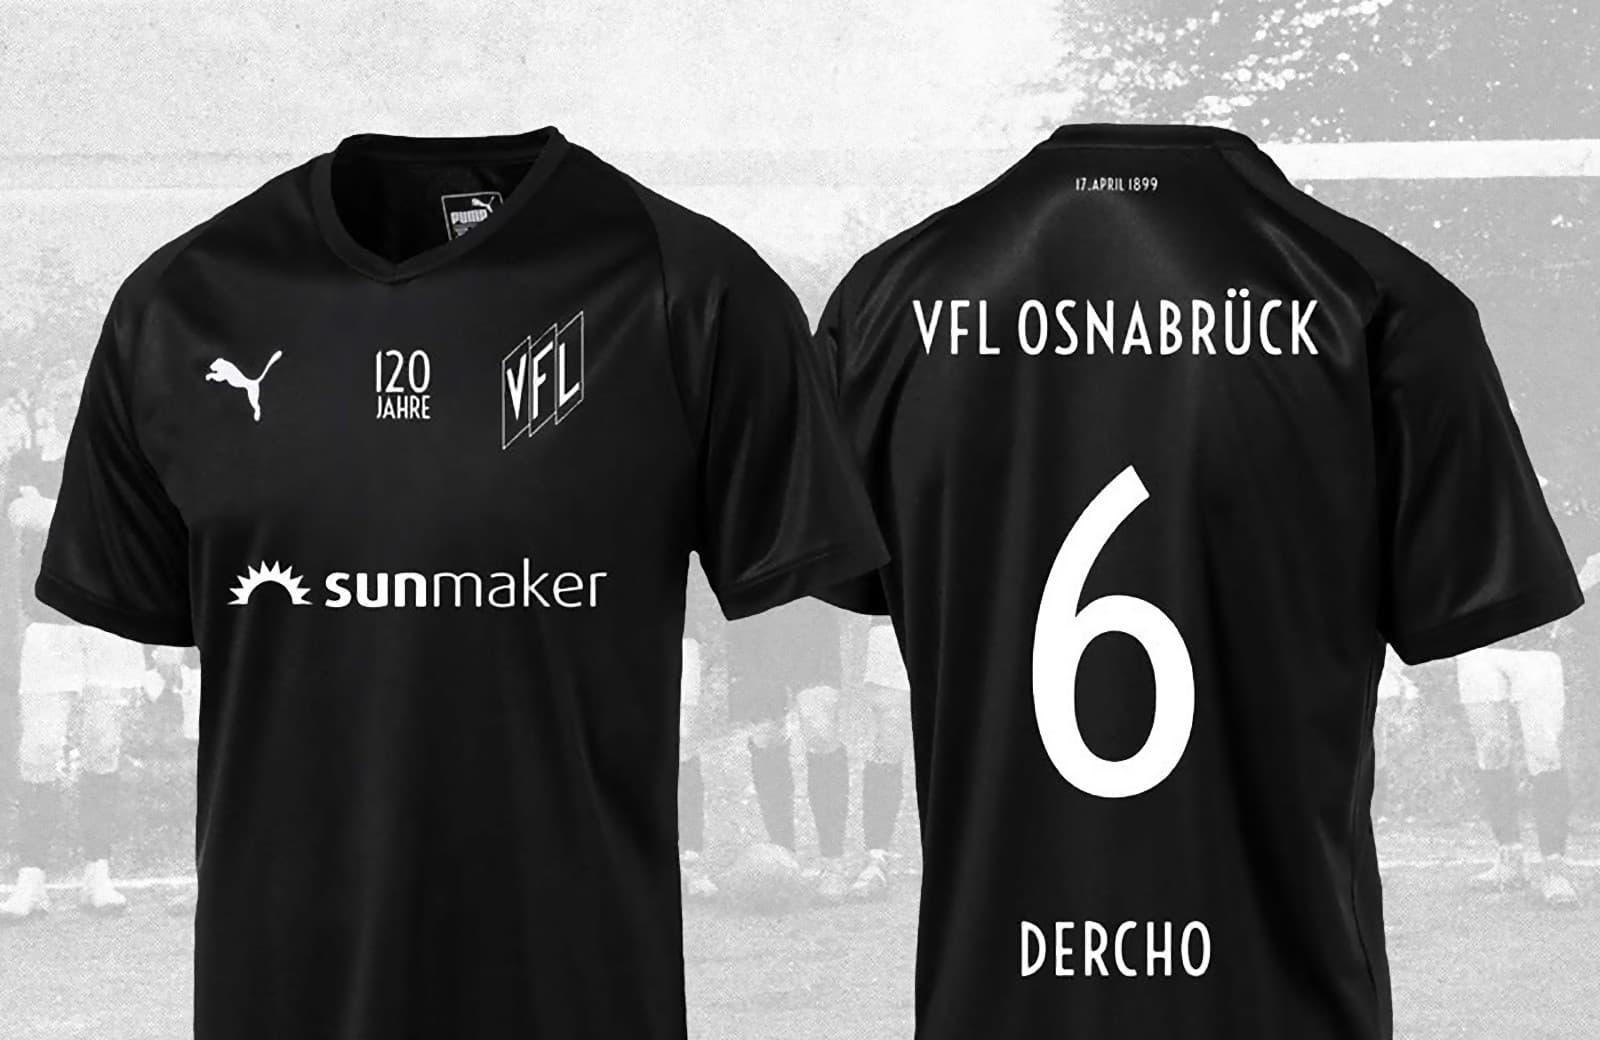 VfLオスナブリュック 120周年記念ユニフォーム - ユニ11